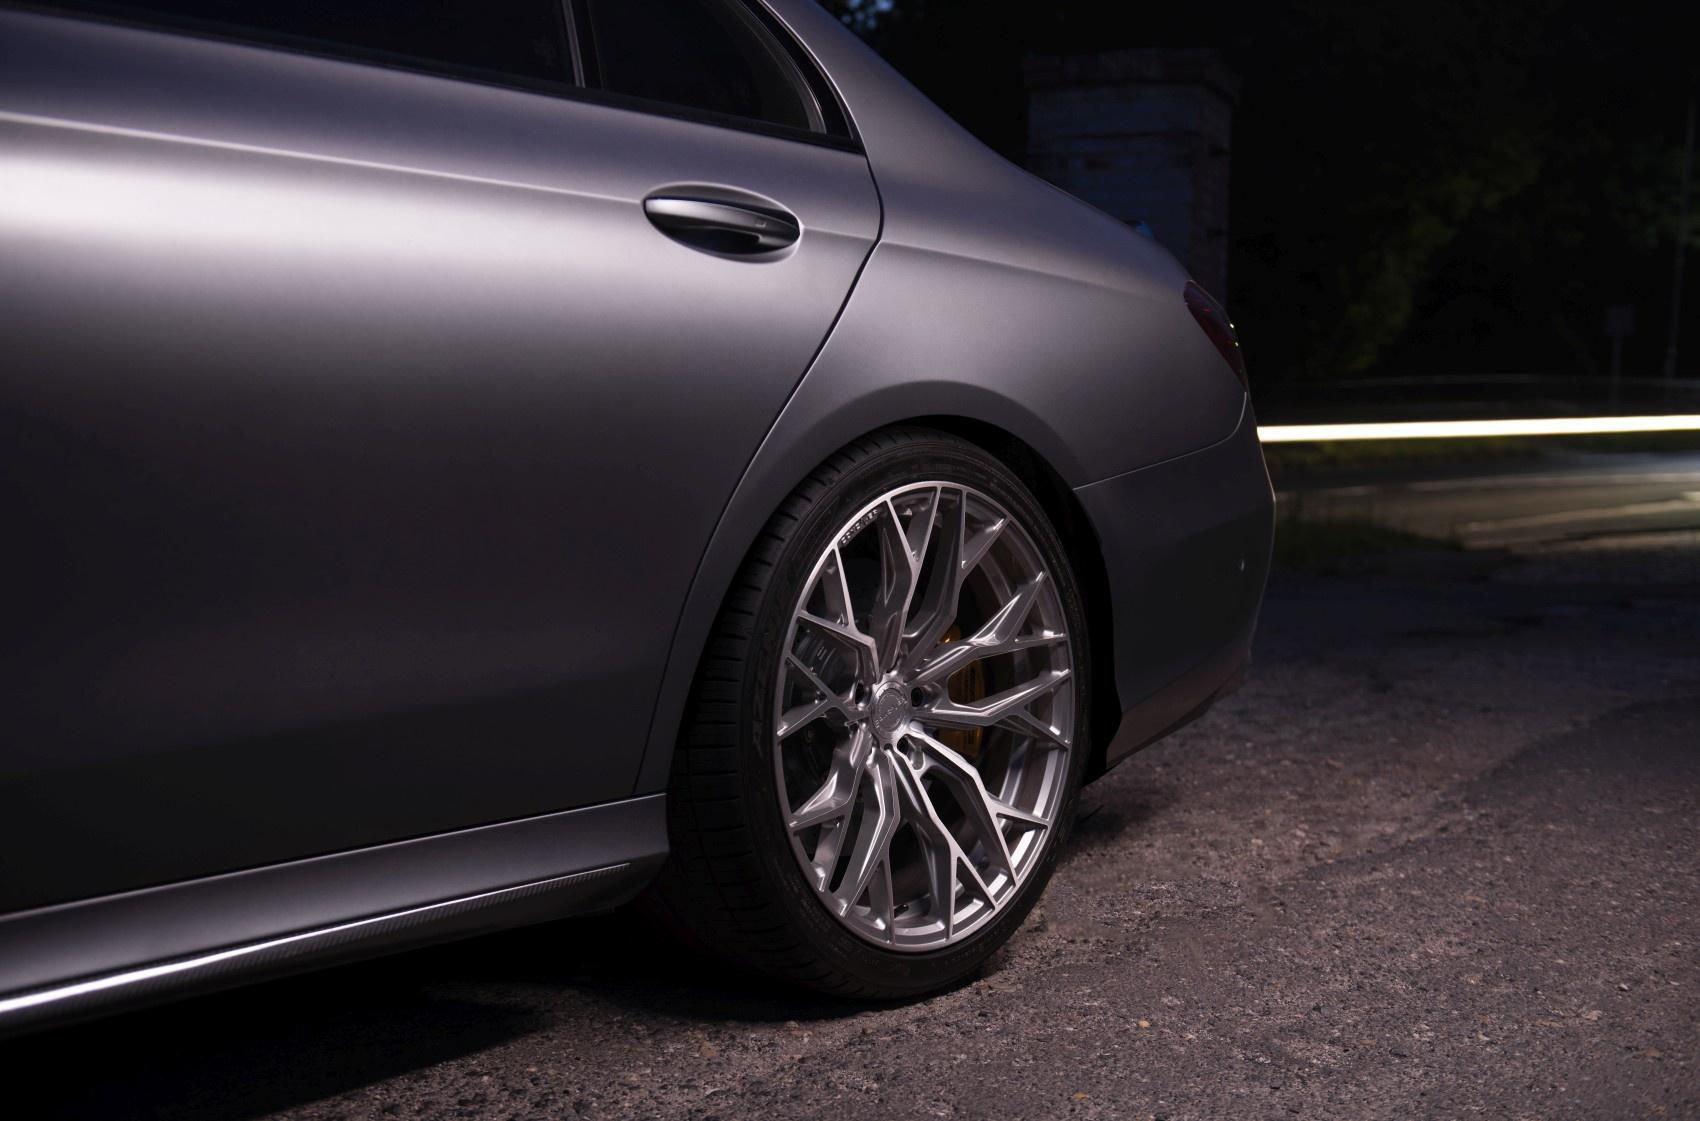 Mercedes-Benz E Class / E63 Concaver CVR1 Brushed Titanium